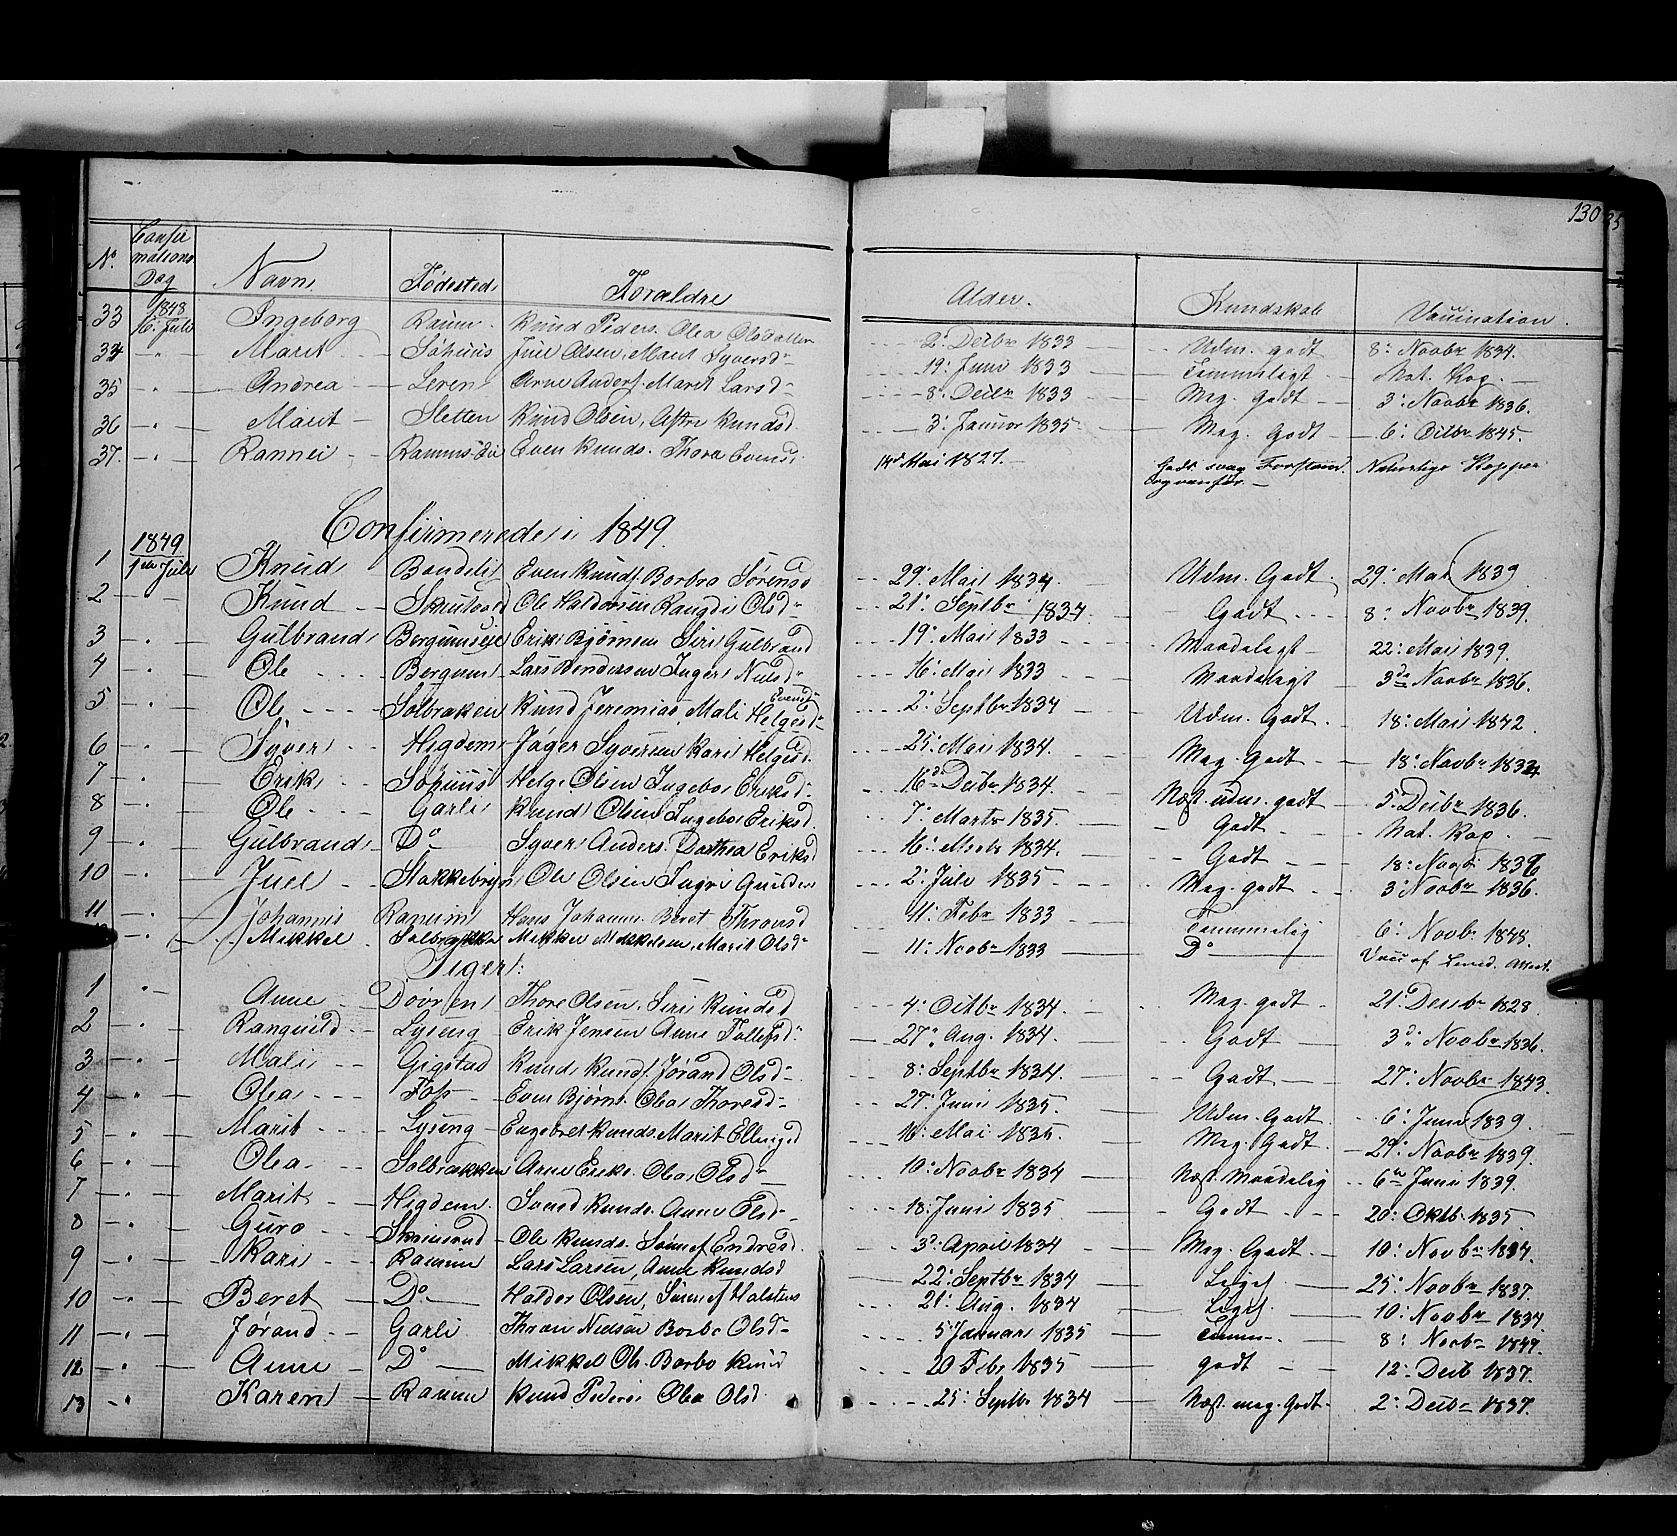 SAH, Nord-Aurdal prestekontor, Ministerialbok nr. 7, 1842-1863, s. 130